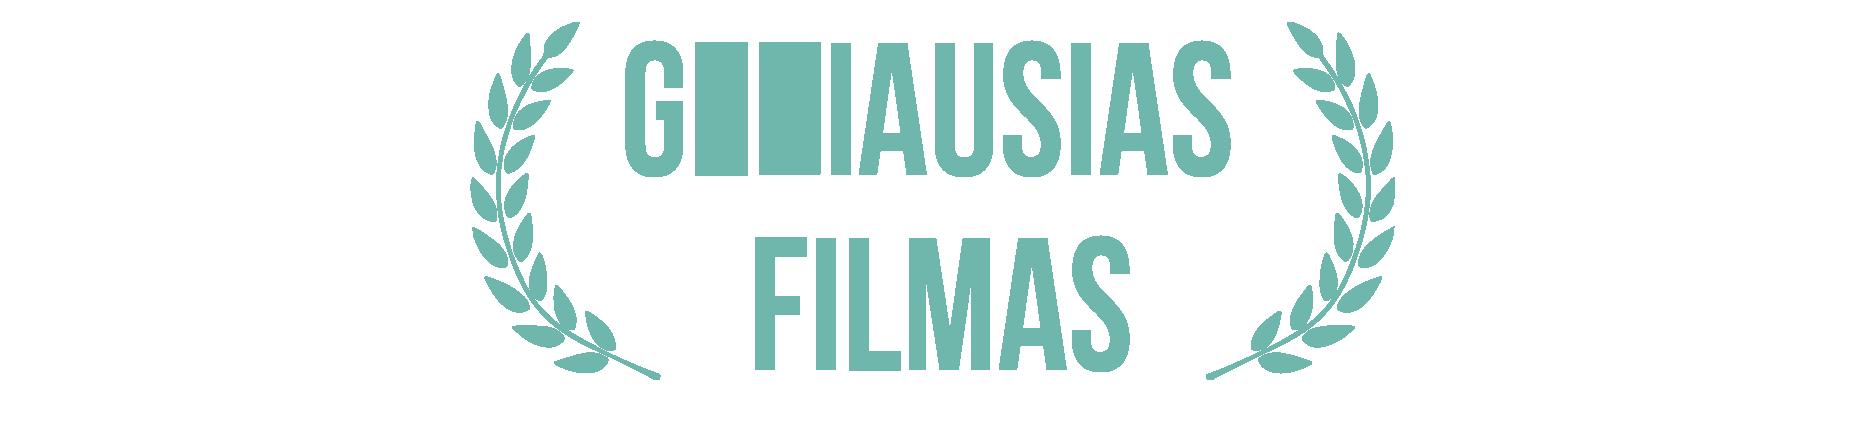 position logo